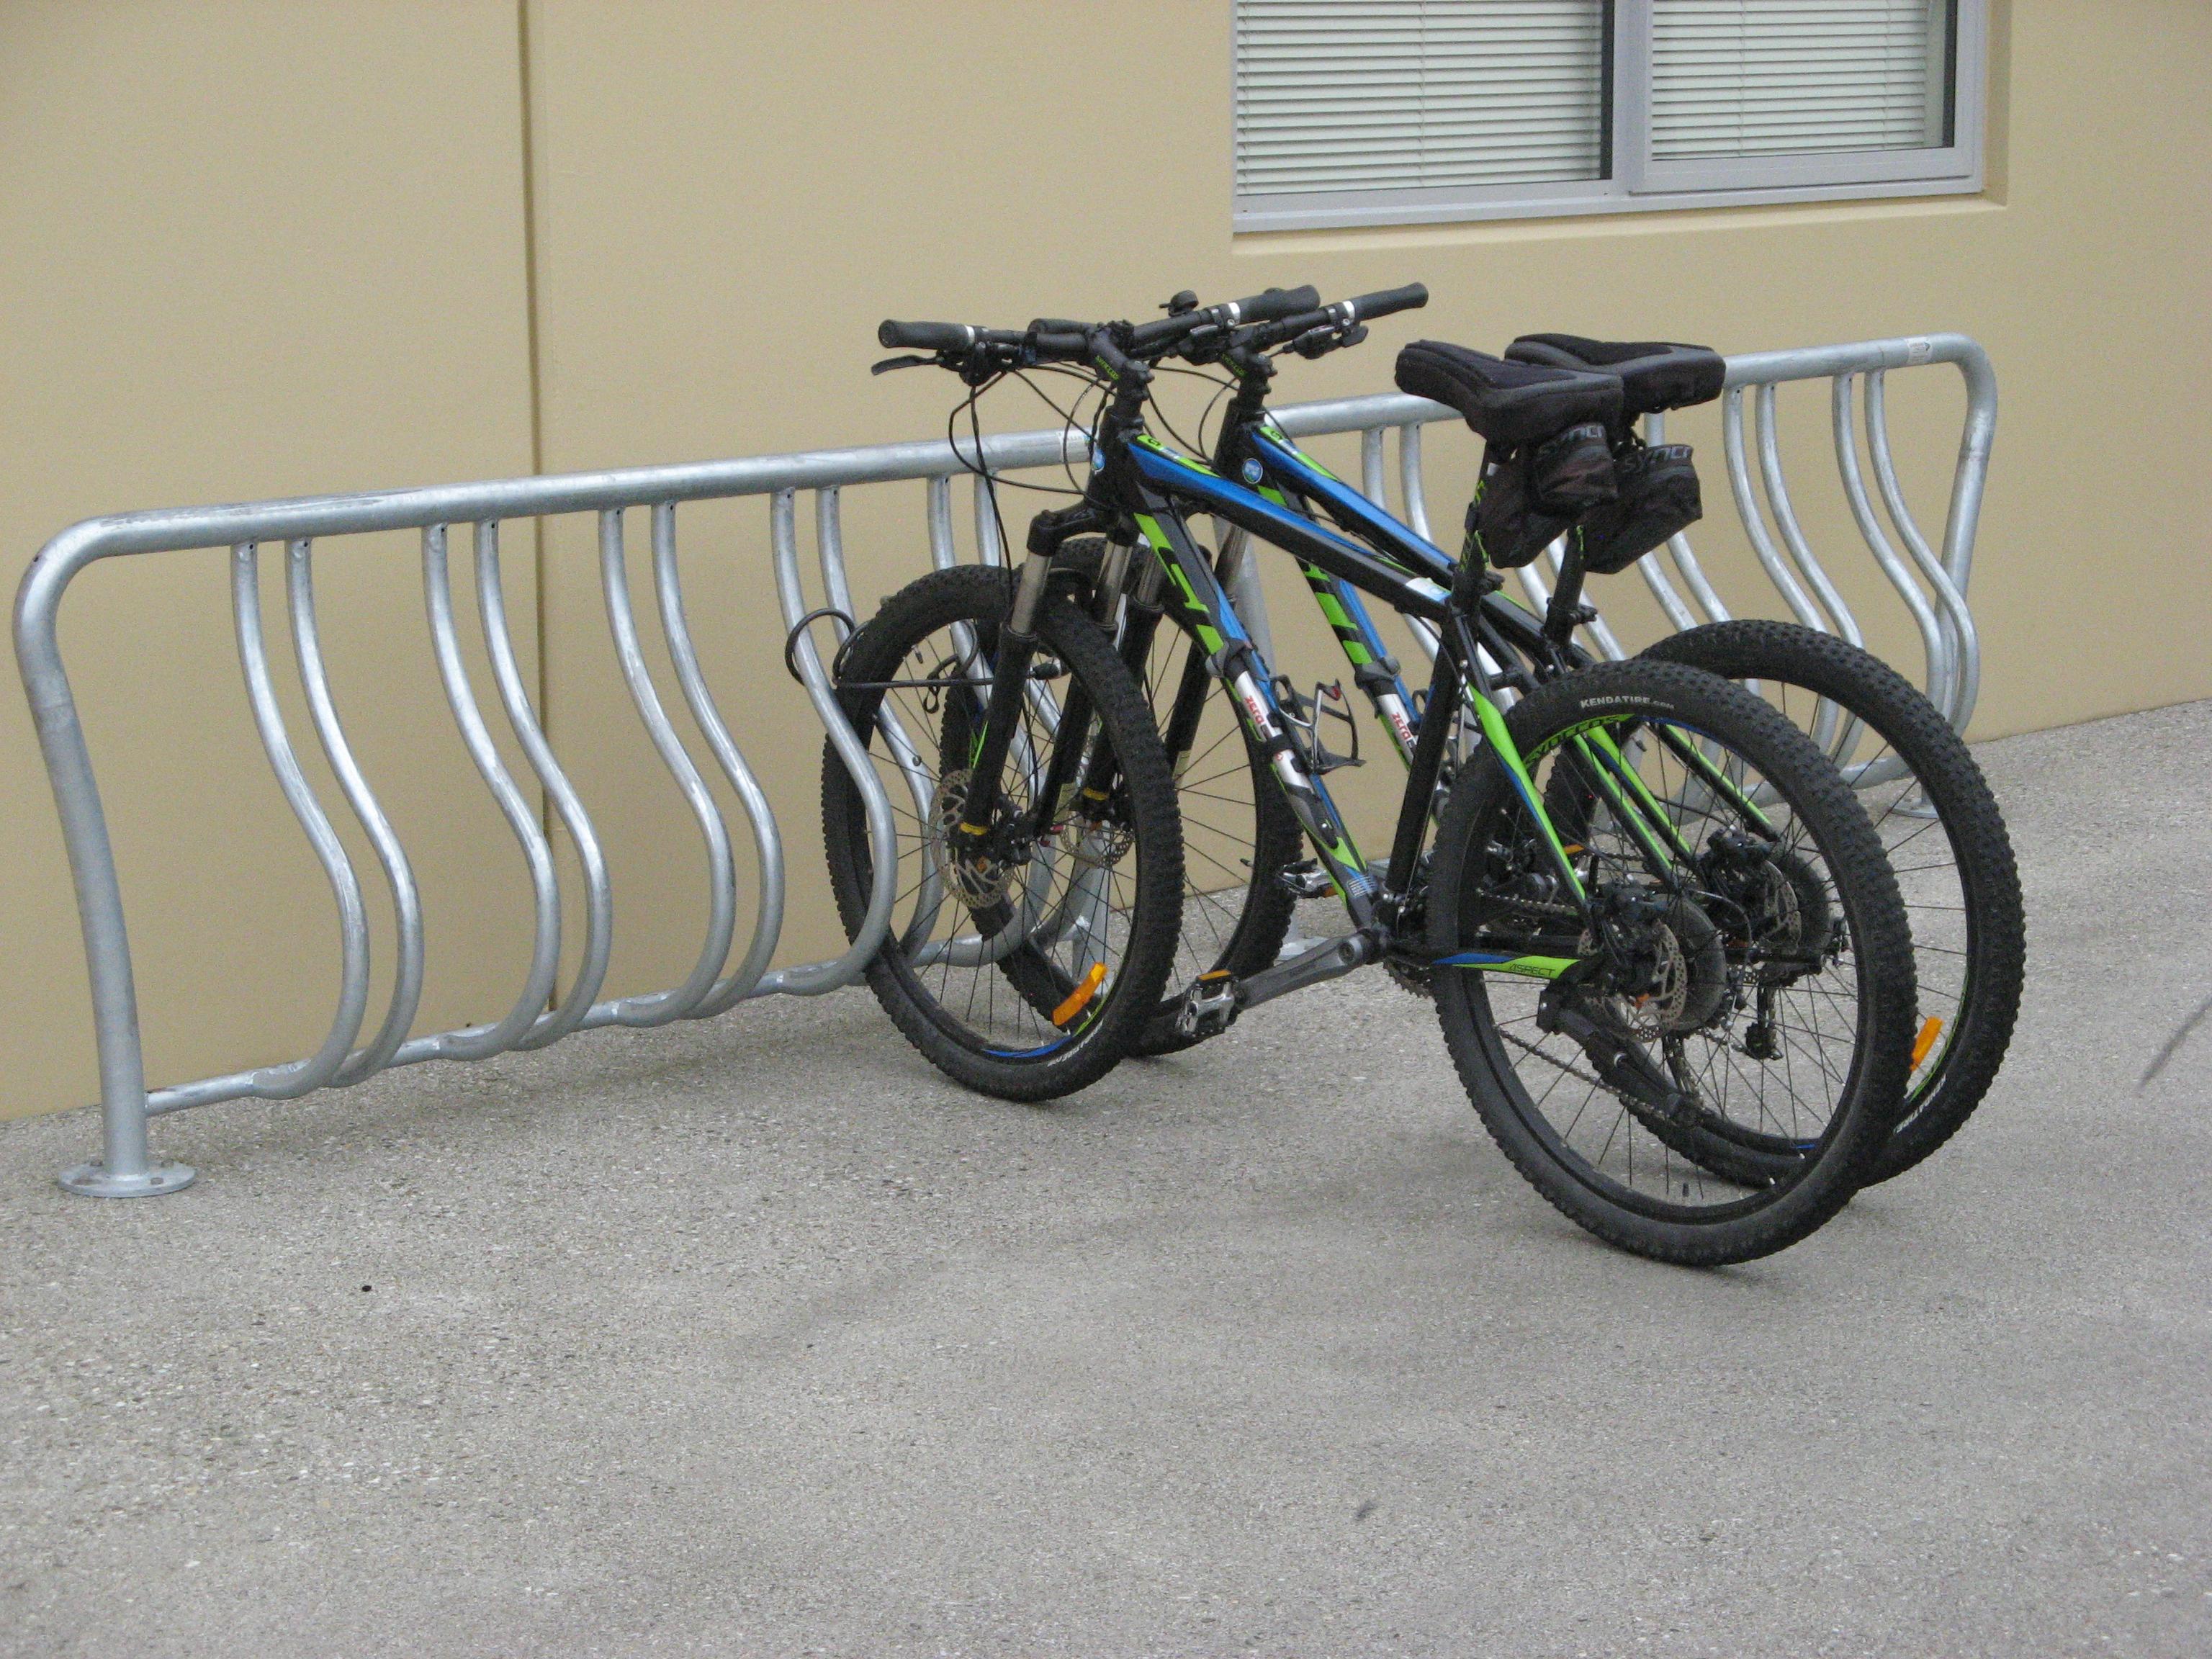 Park bike rack photo